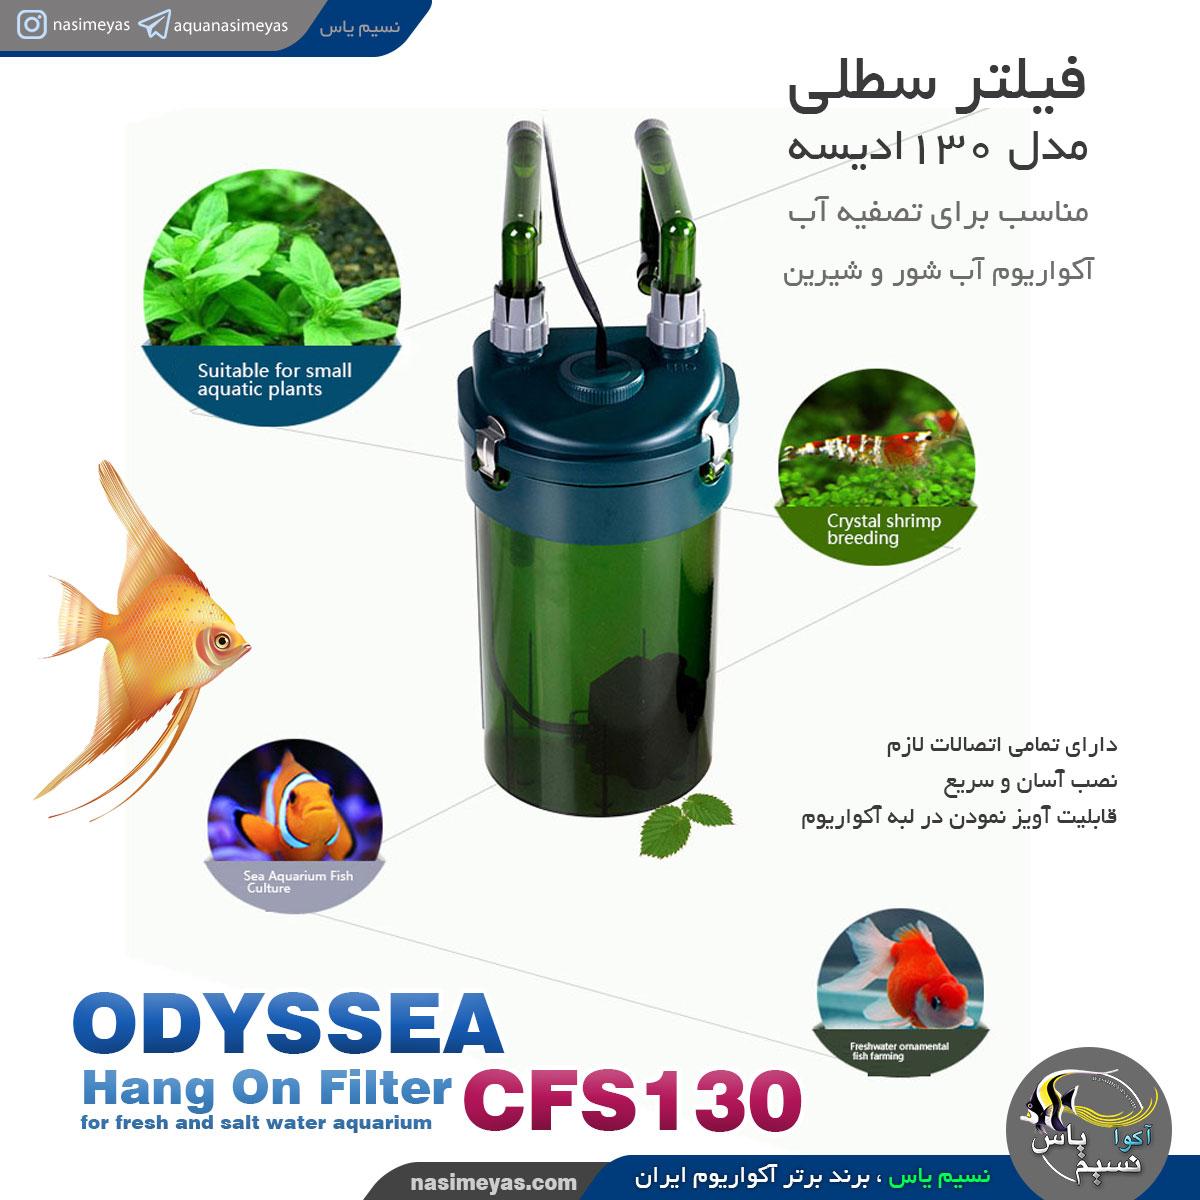 فیلتر هنگان CFS-130 ادیسه